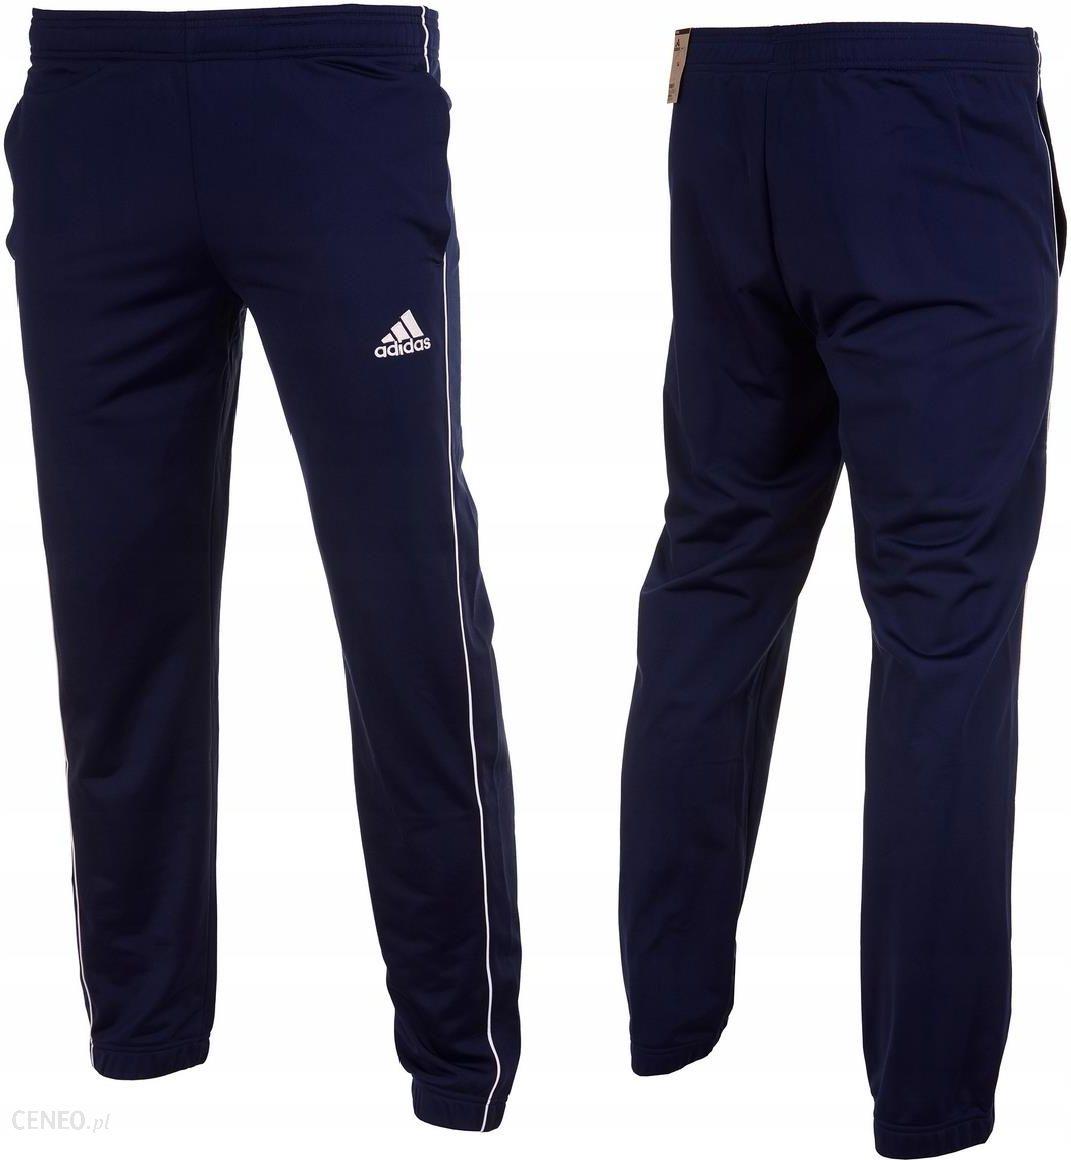 Adidas Spodnie Dresowe Junior Core 18 CV3586 r 152